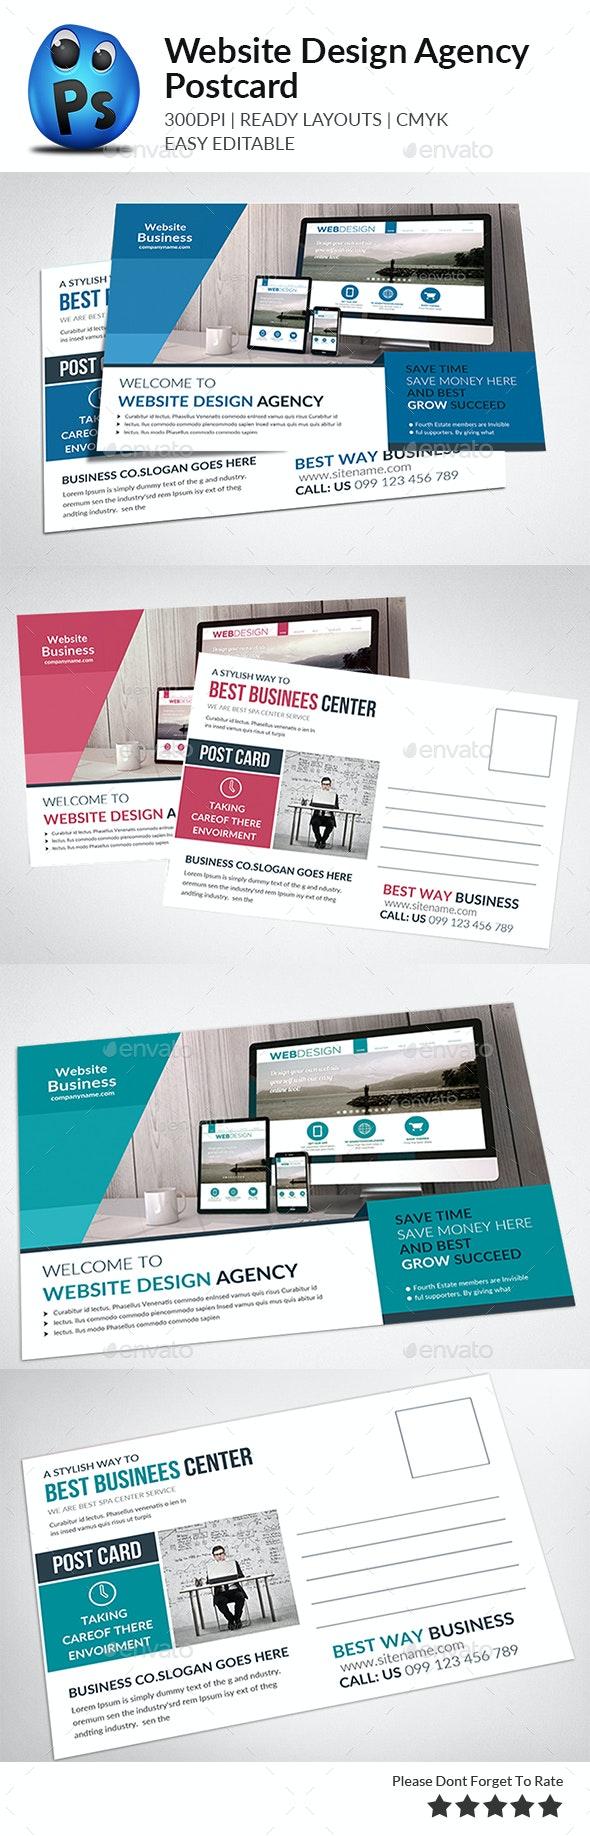 Website Design Agency Postcards - Cards & Invites Print Templates